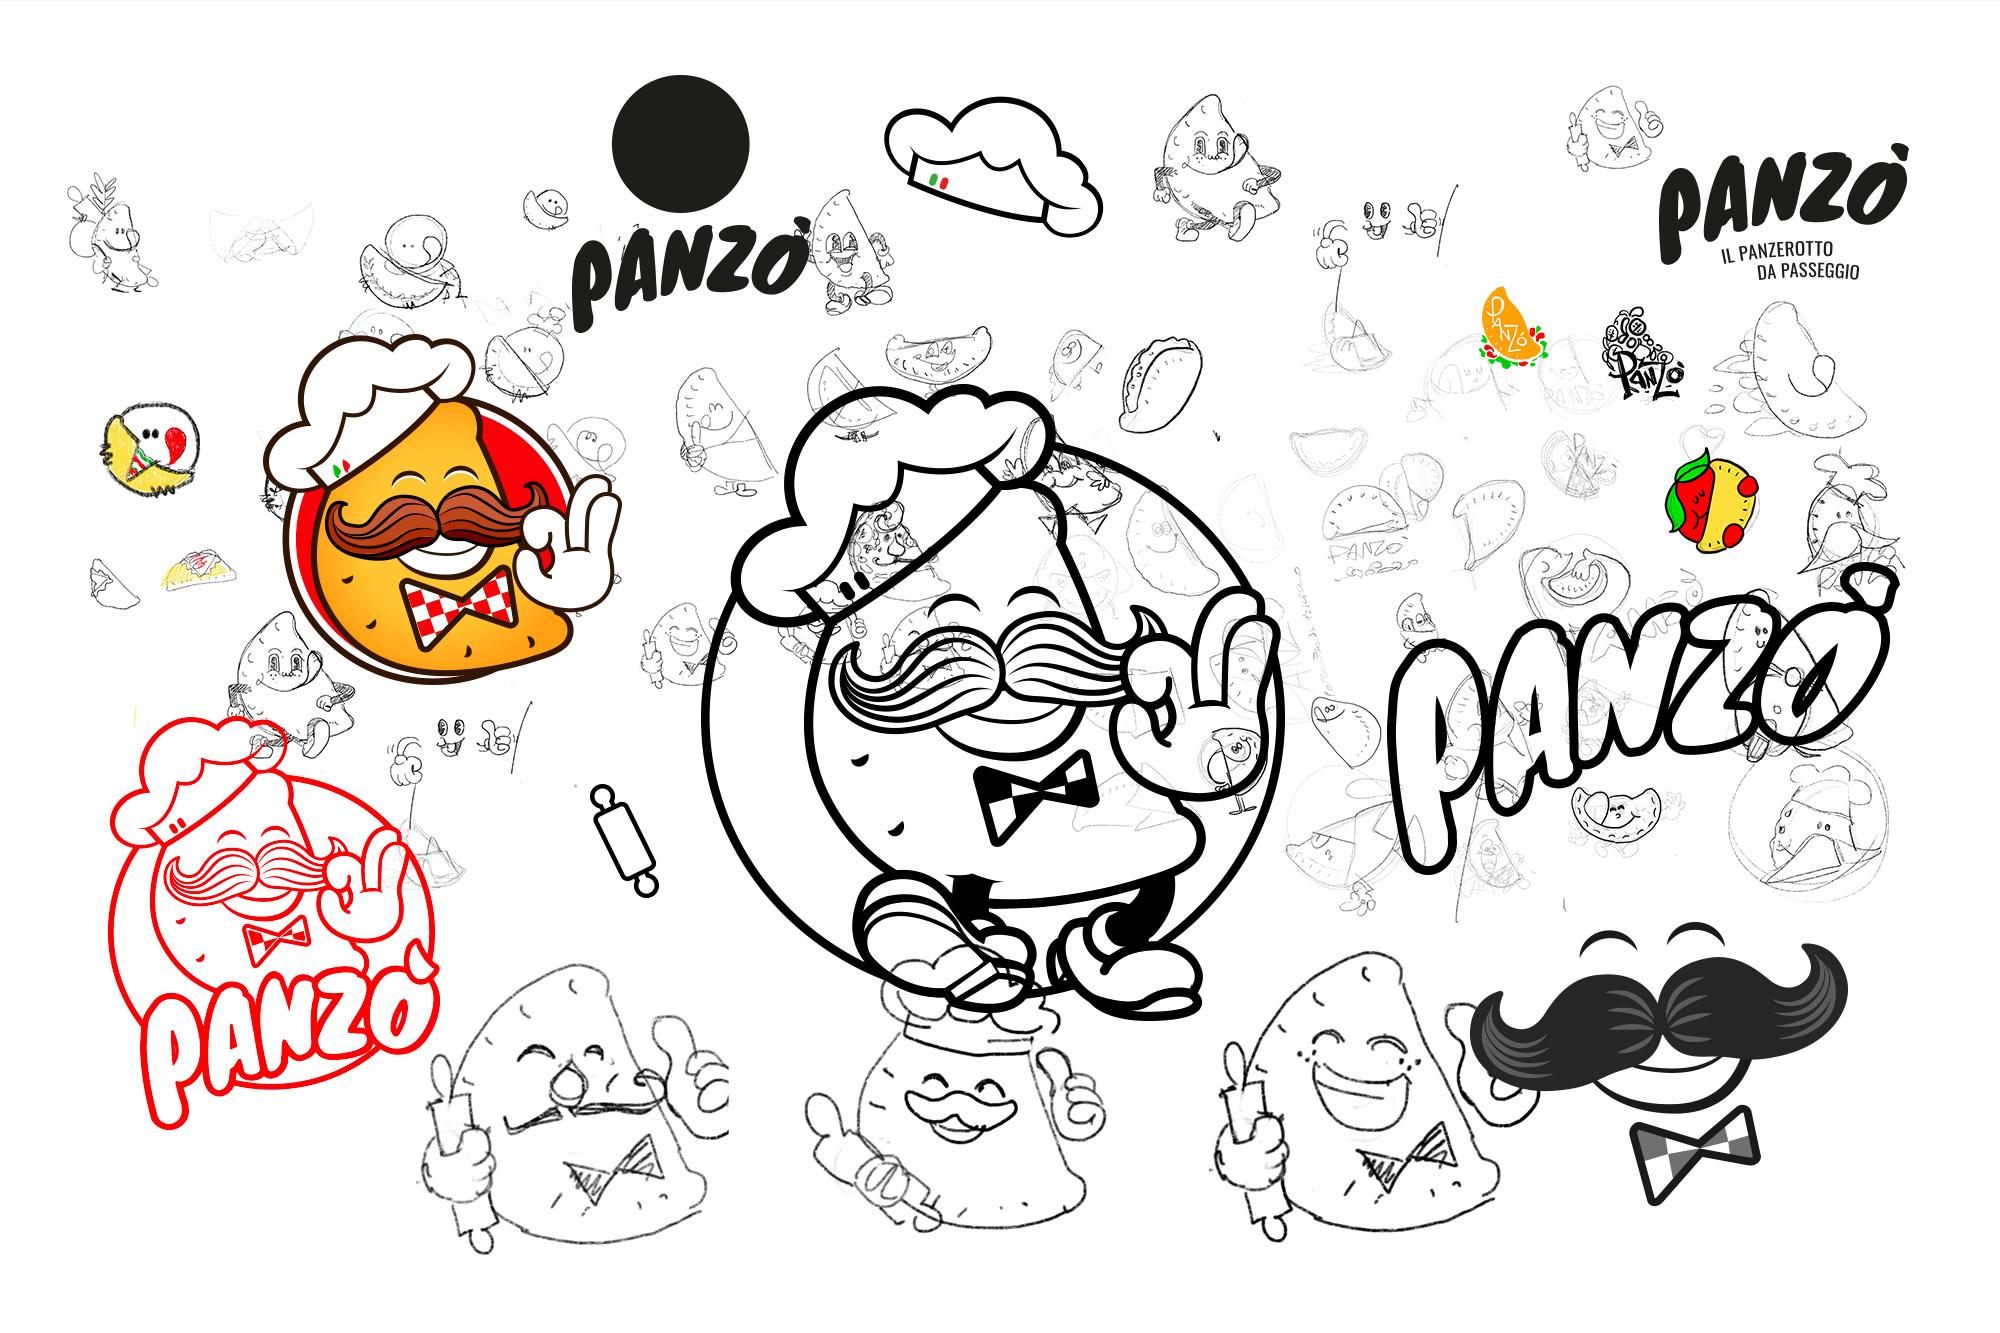 Panzò - Panzerotto da passeggio - logo, branding - img 2